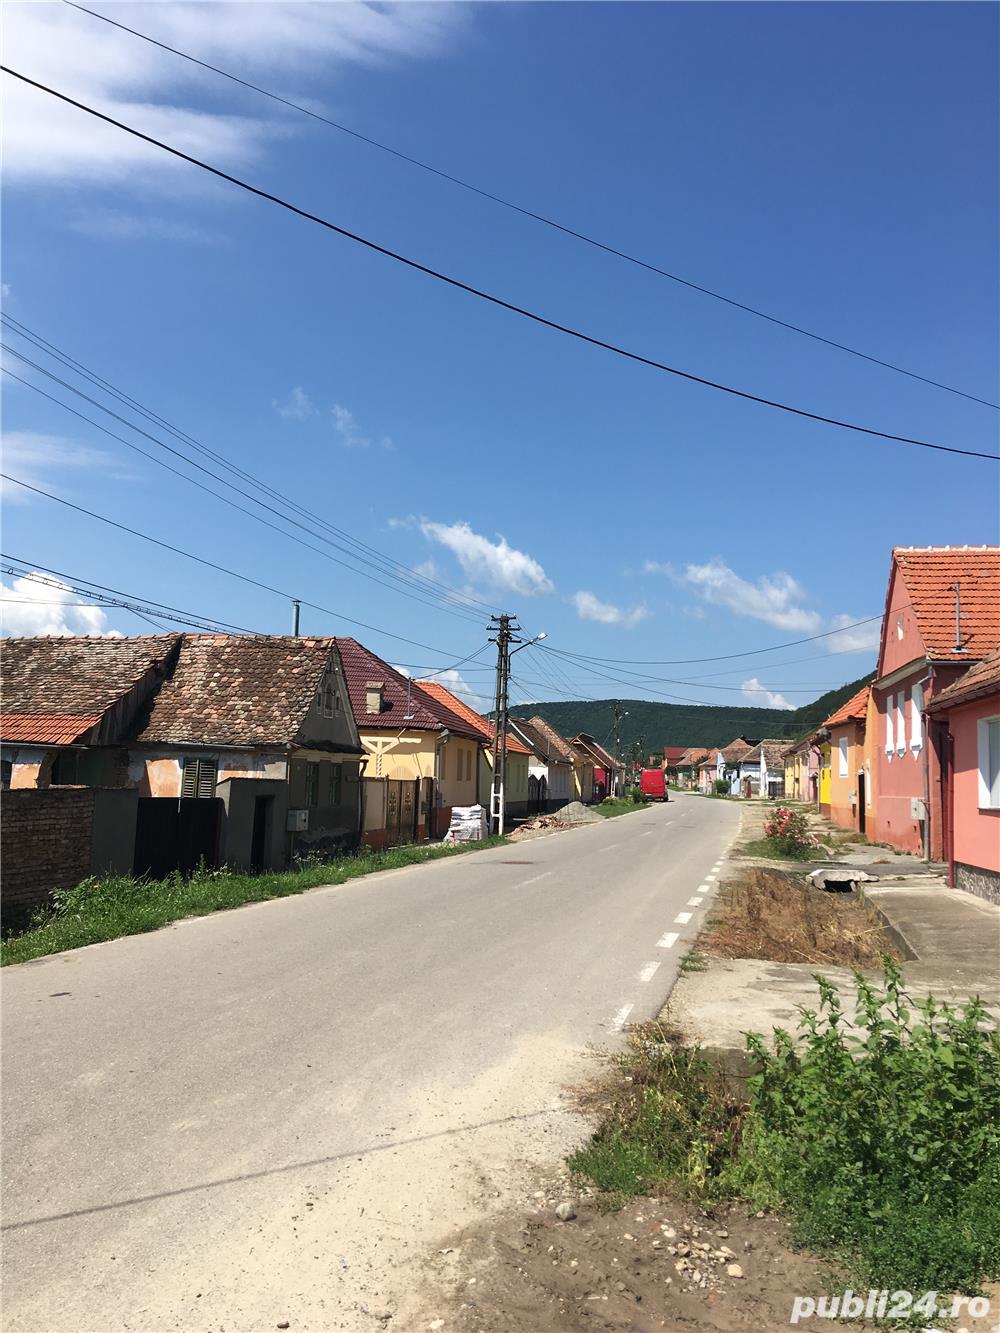 Vand casa saseasca in Seica Mare (Sibiu) central cu teren de 1500 m